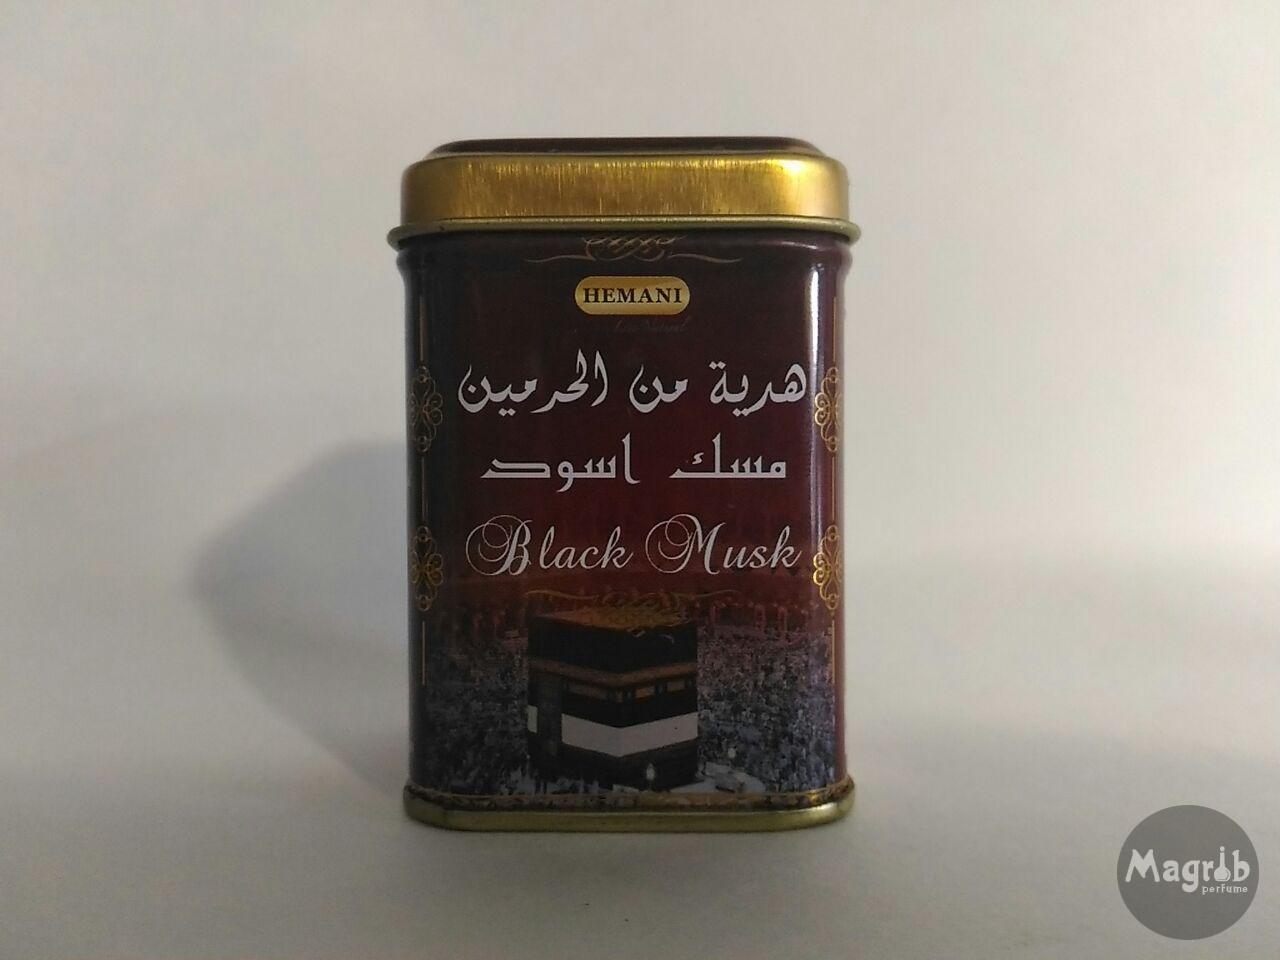 Hemani Black Musk- ароматизатор.